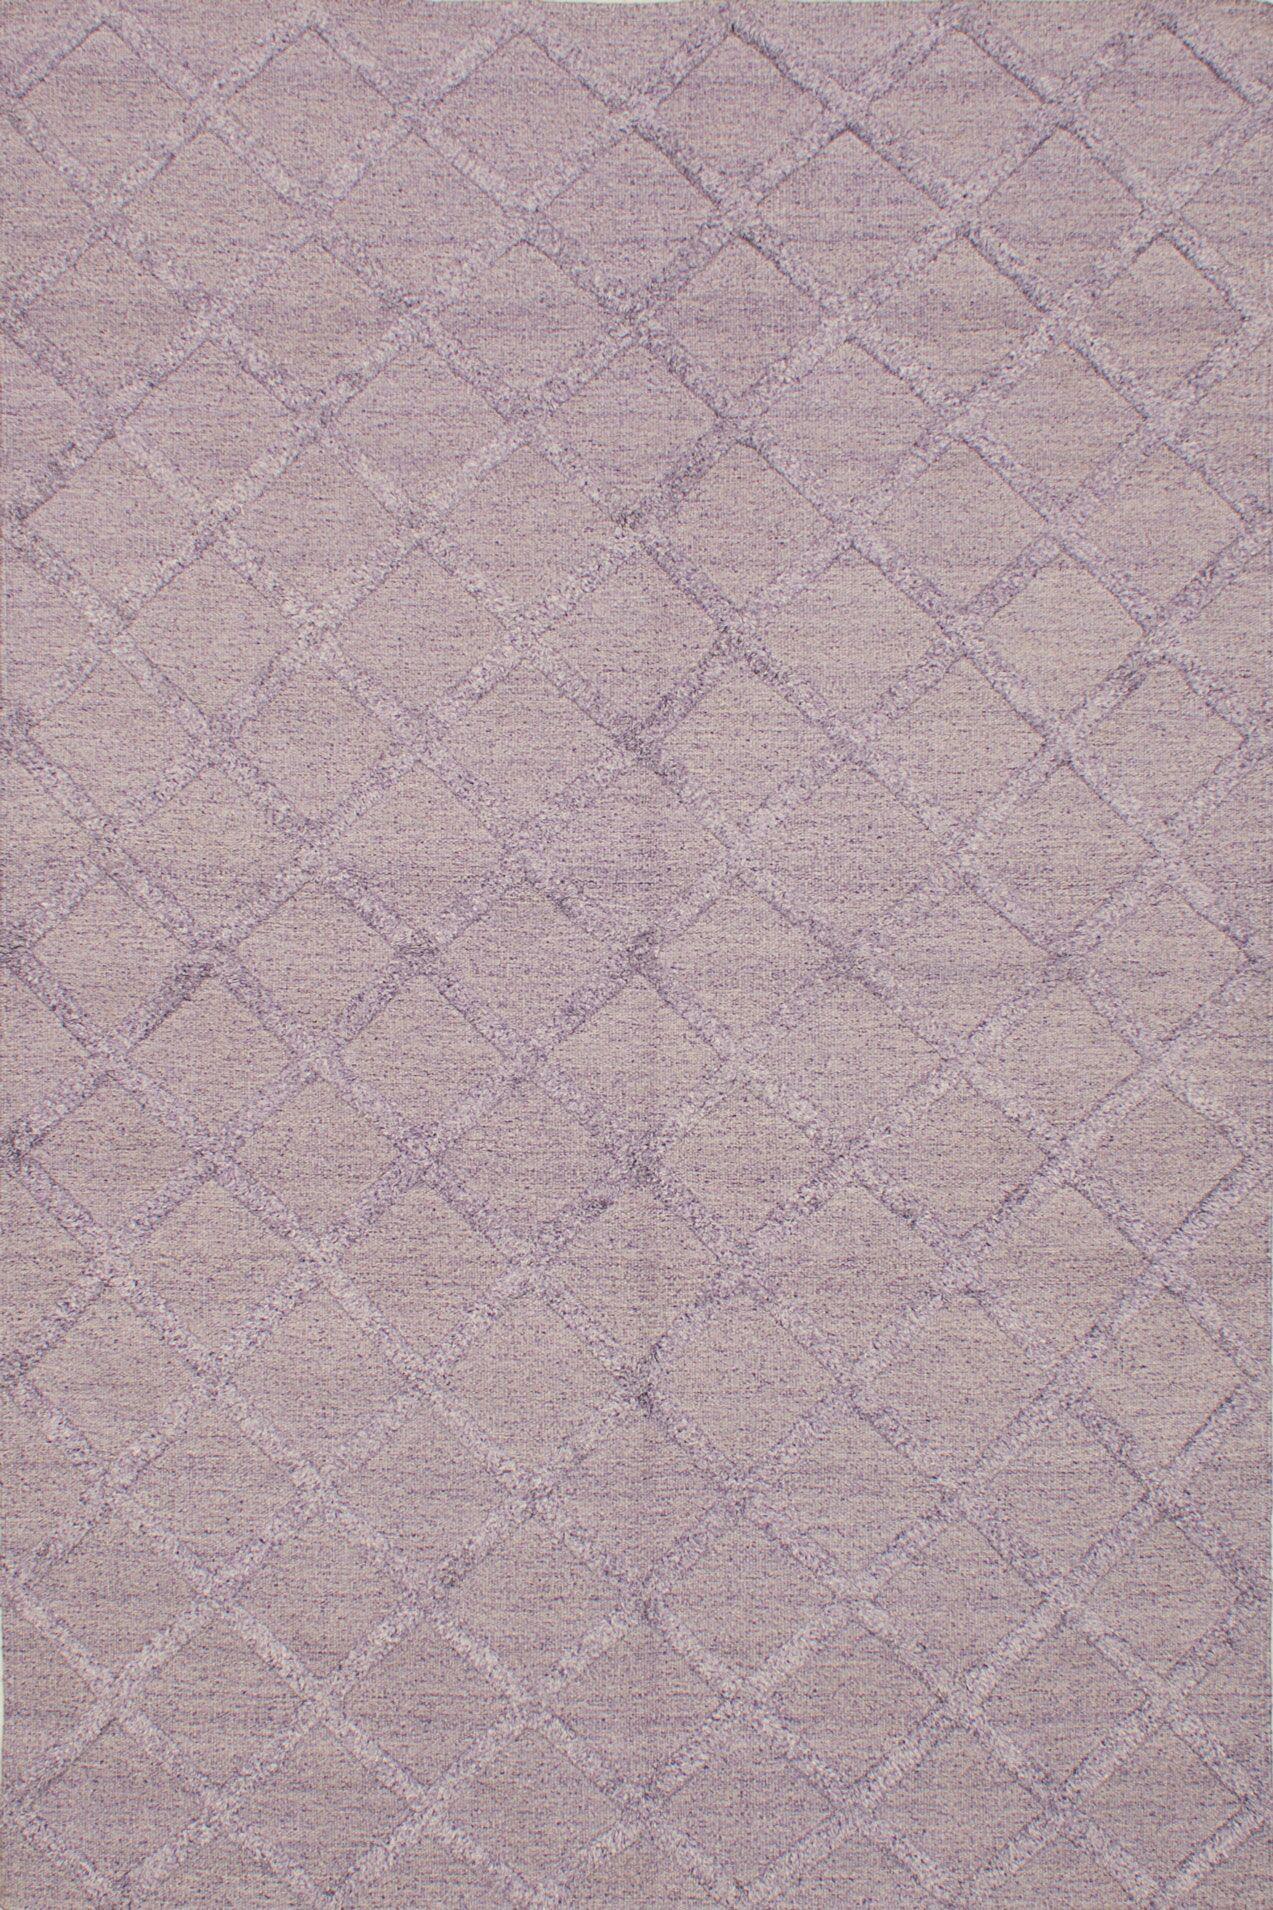 Bonefield Kilim Light Violet Area Rug